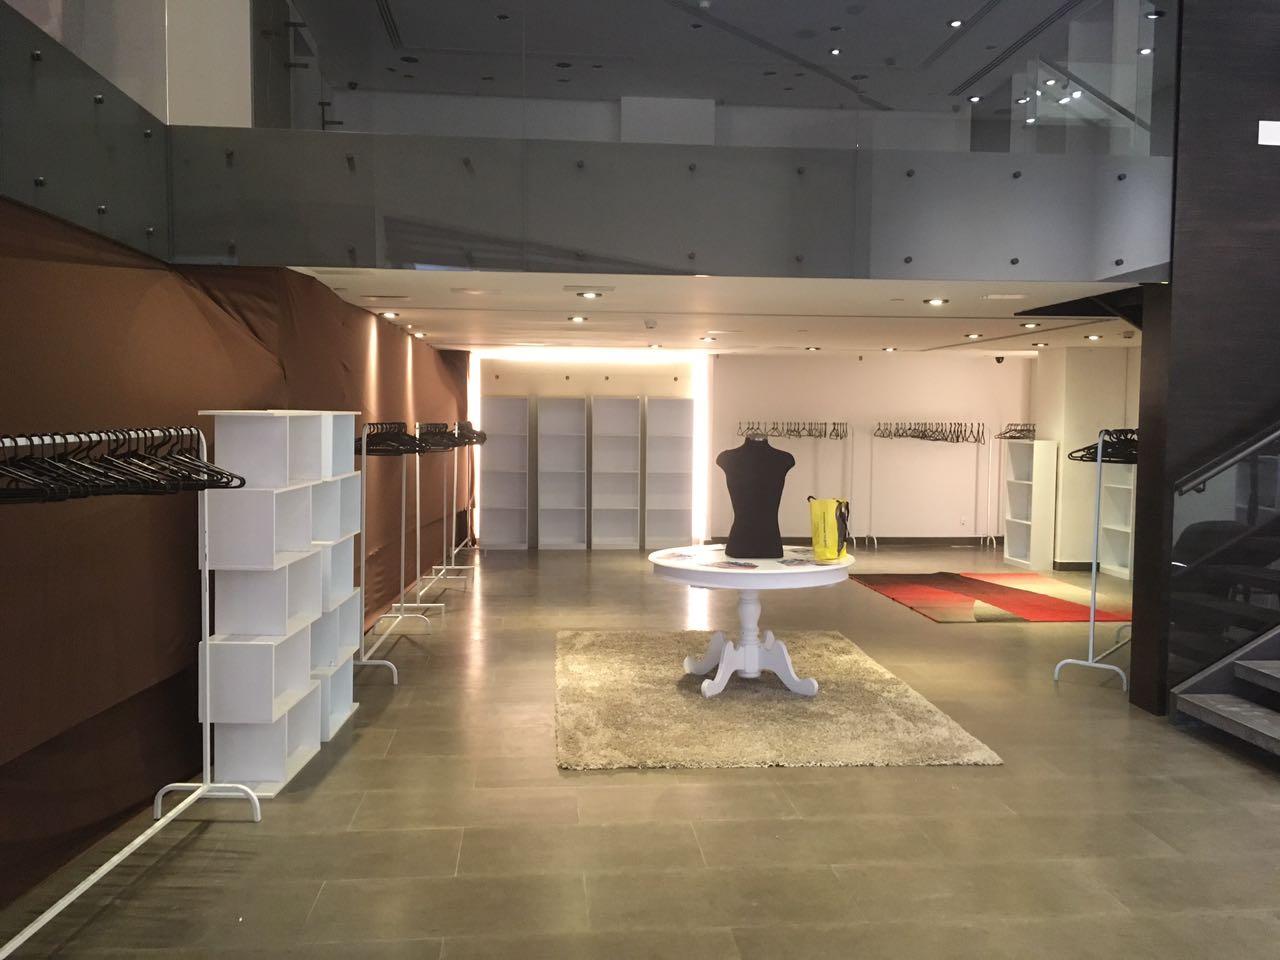 Shopping Metrô Tucuruvi inaugura loja de doação by Casas André Luiz 2